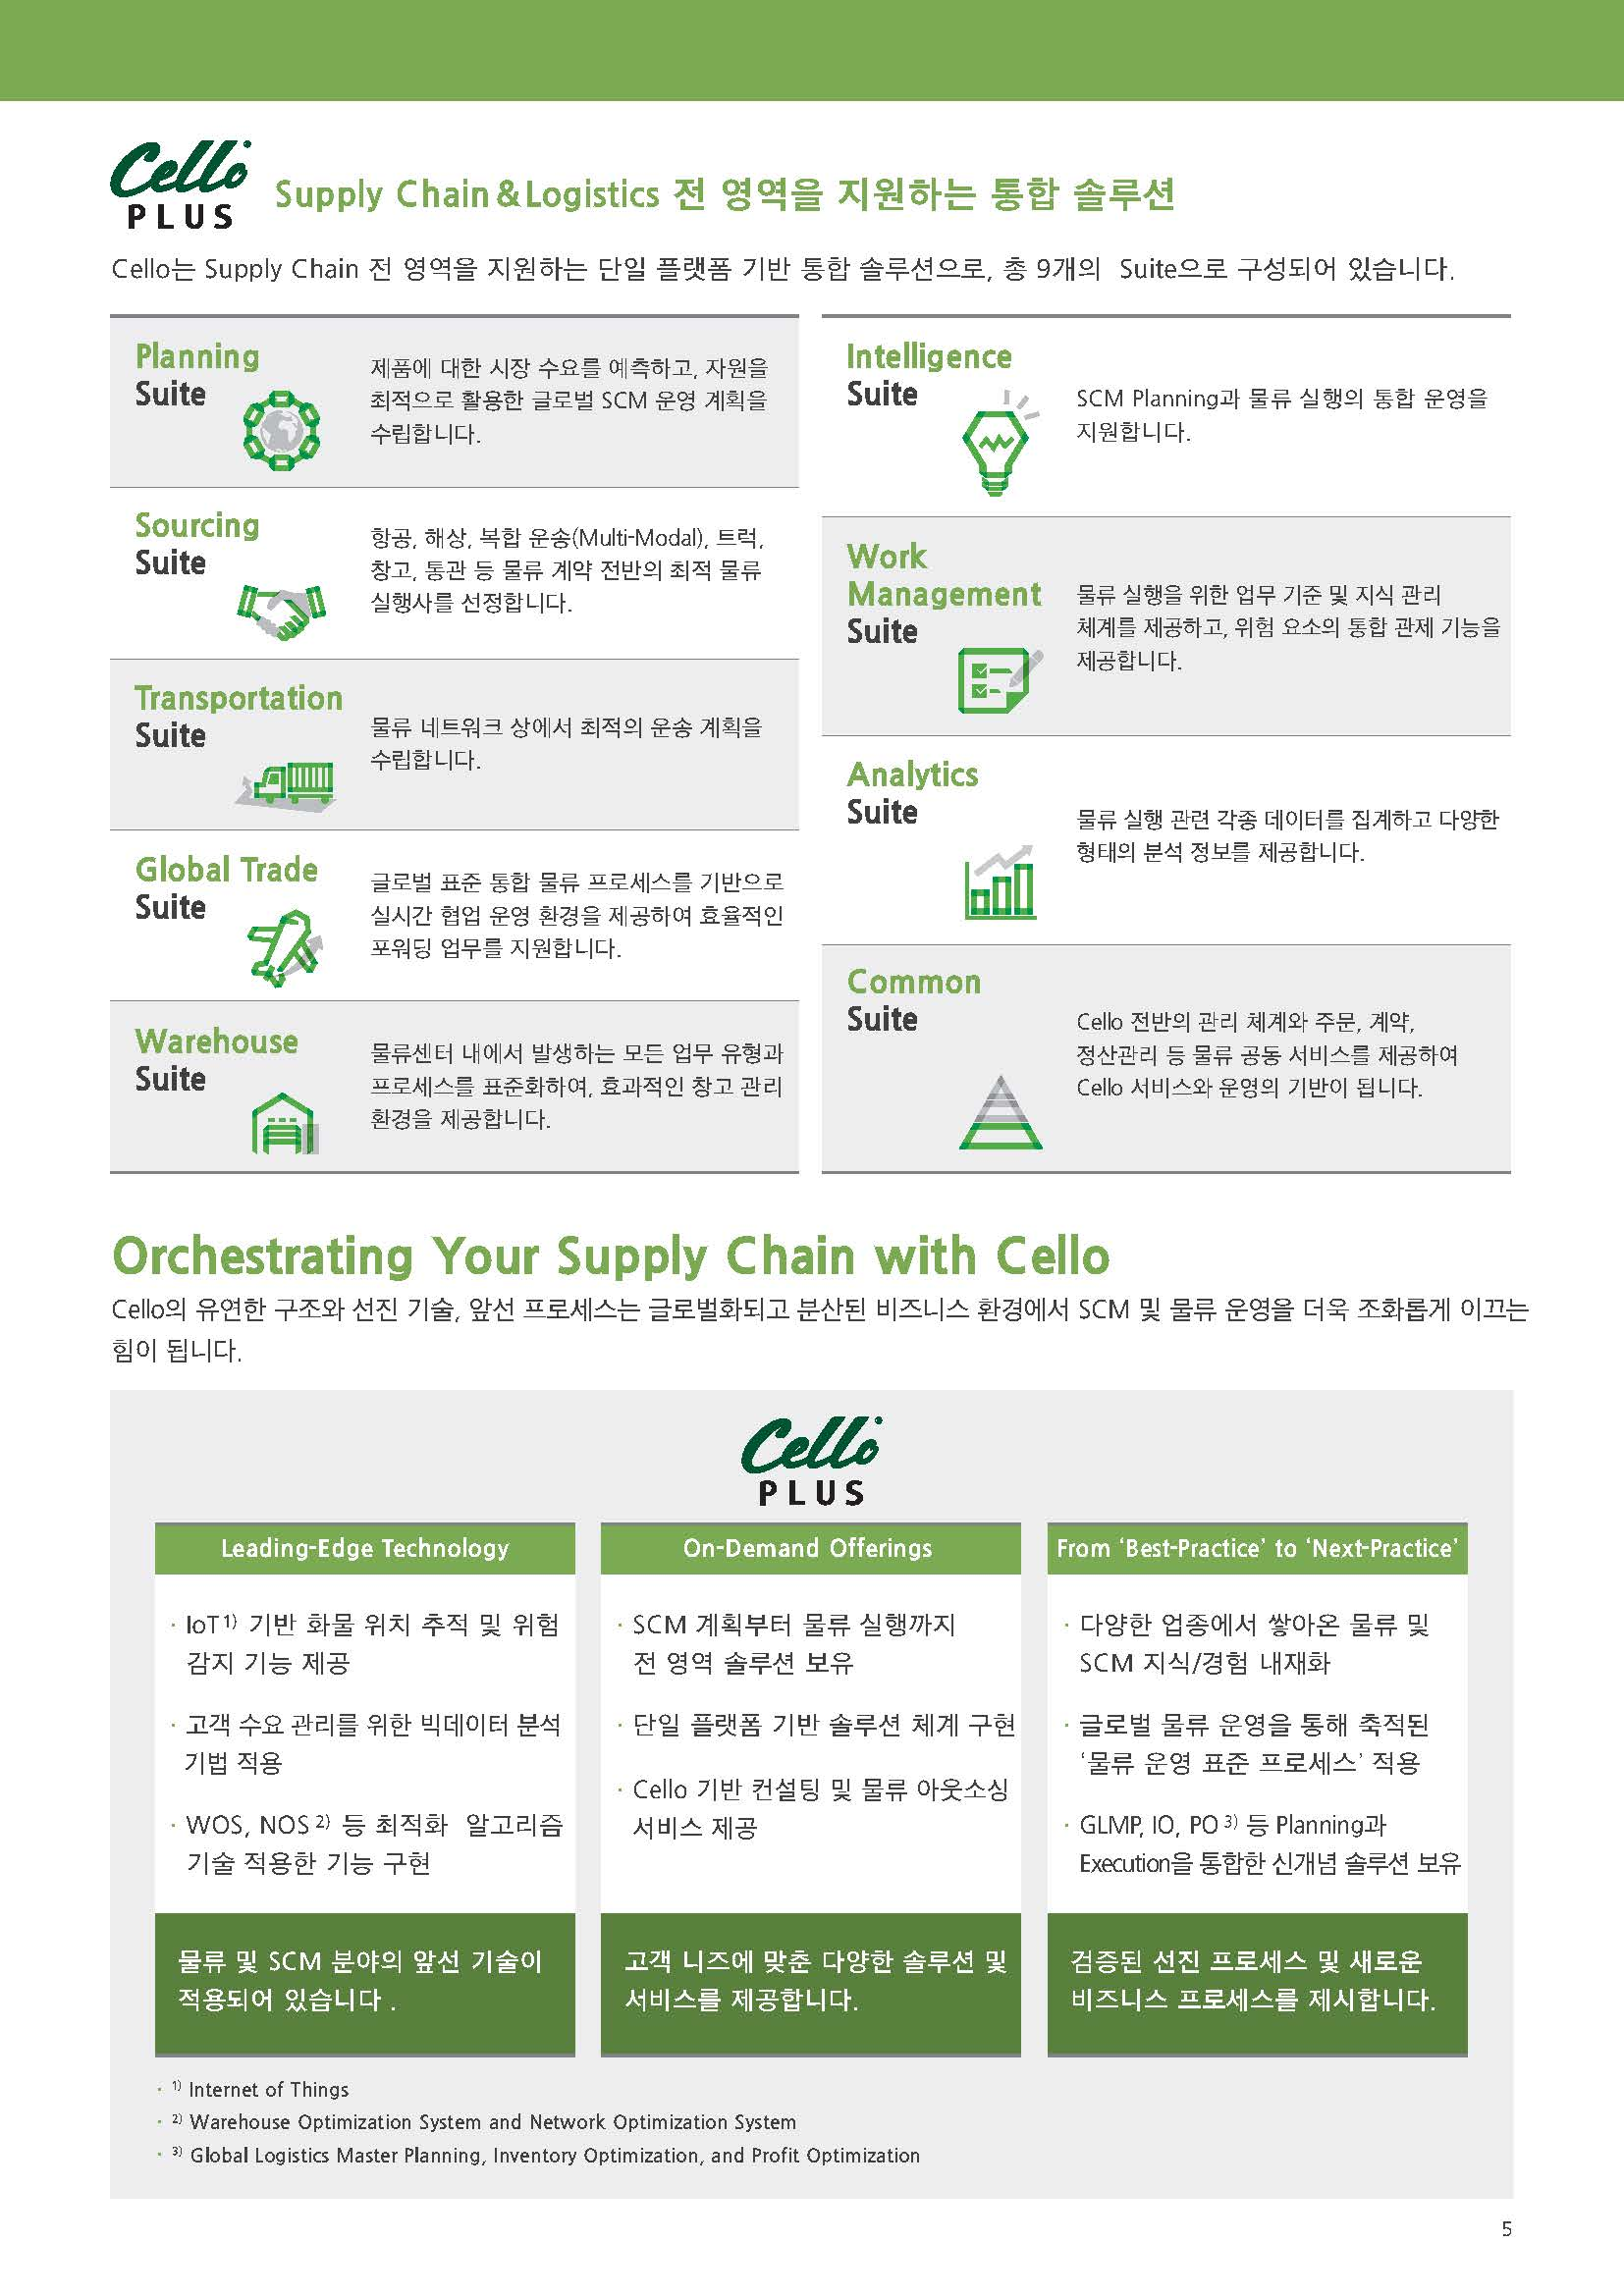 Cello Plus, Supply Chain & Logistics 전 영역을 지원하는 통합 솔루션